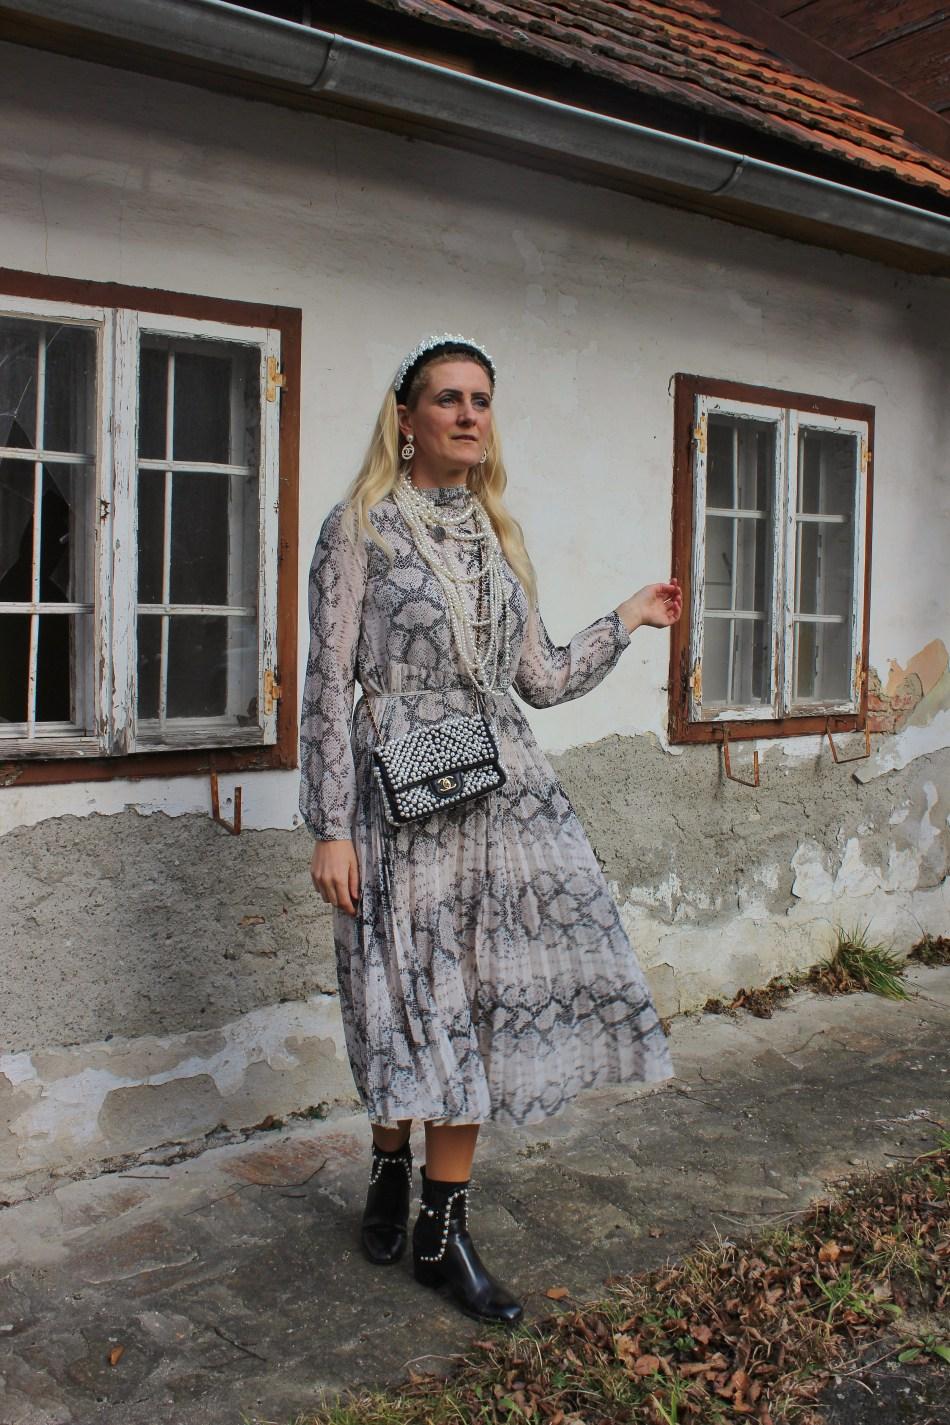 Snakeprint-Dress-Pearls-Boots-Zara-Chanel-Pearlbag-carrieslifestyle-Tamara-Prutsch